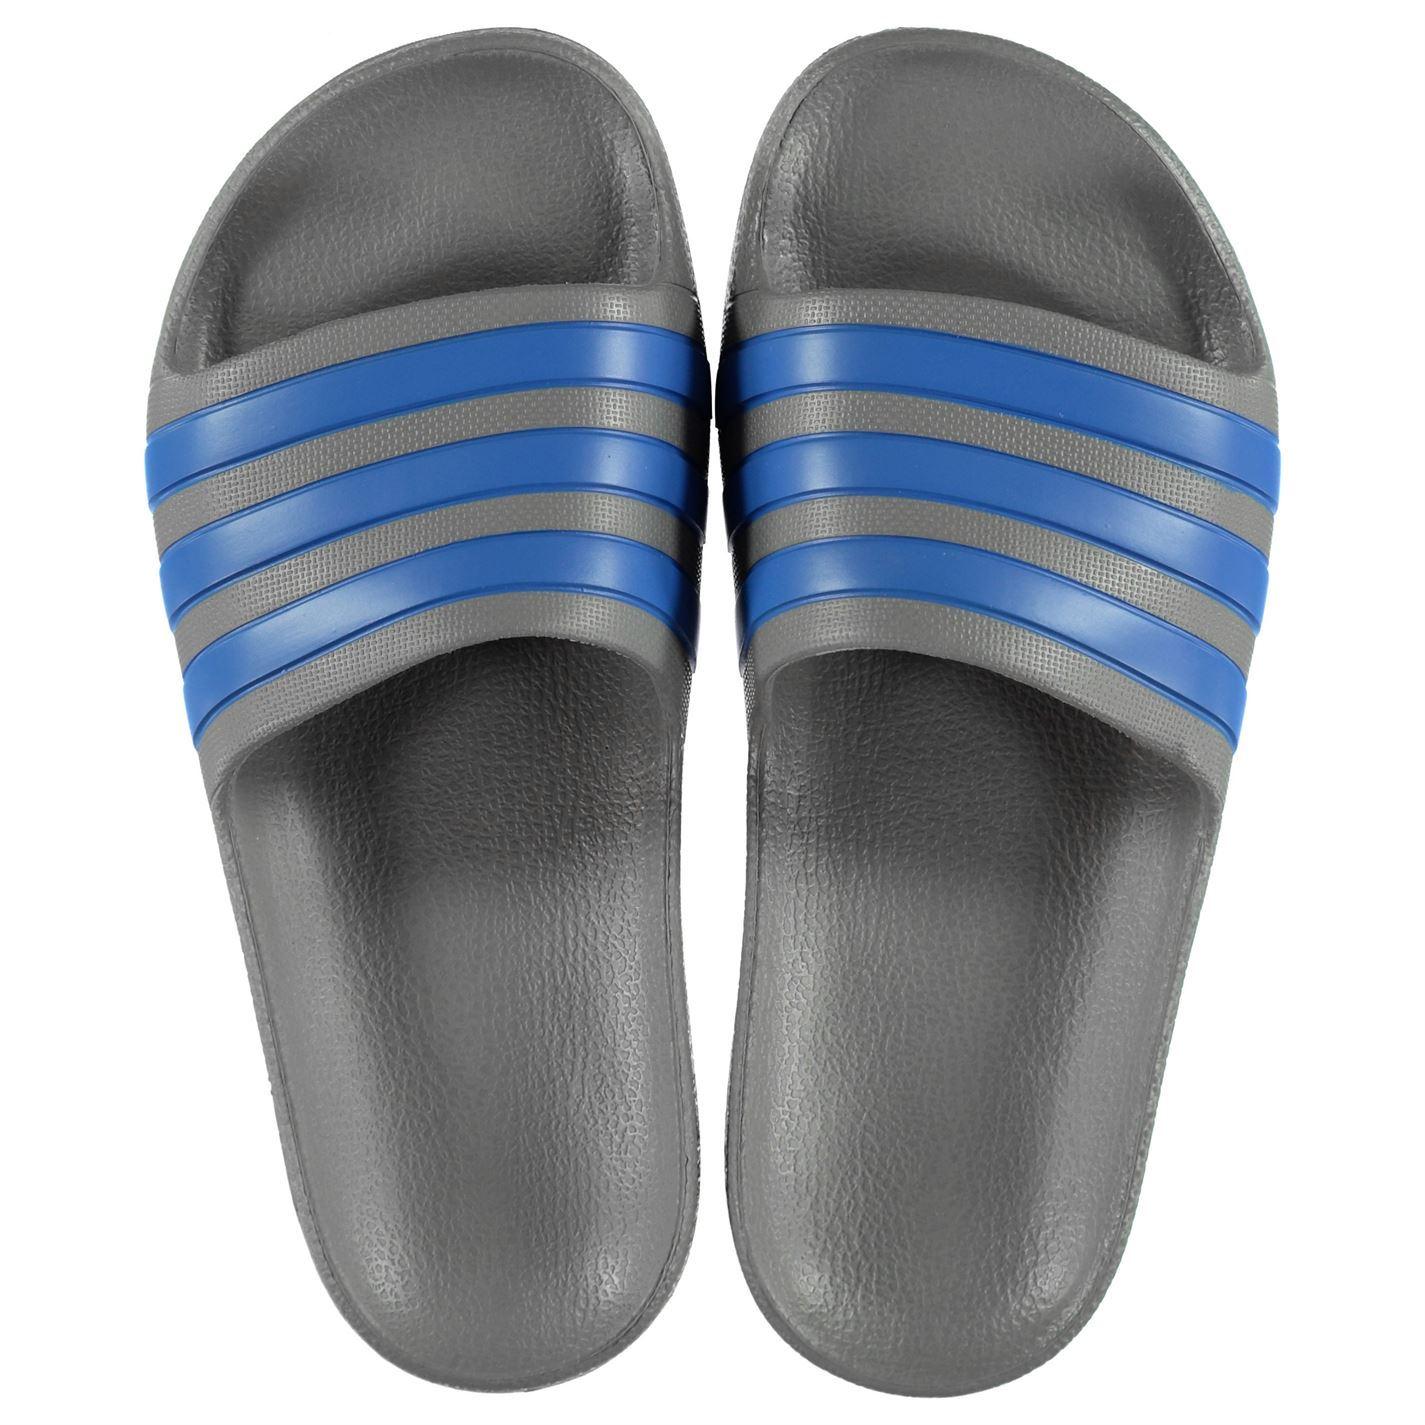 miniatura 17 - ADIDAS-Duramo-Slide-Piscina-Scarpe-Bambino-Ragazzo-Sandali-Infradito-Spiaggia-Scarpe-Thongs